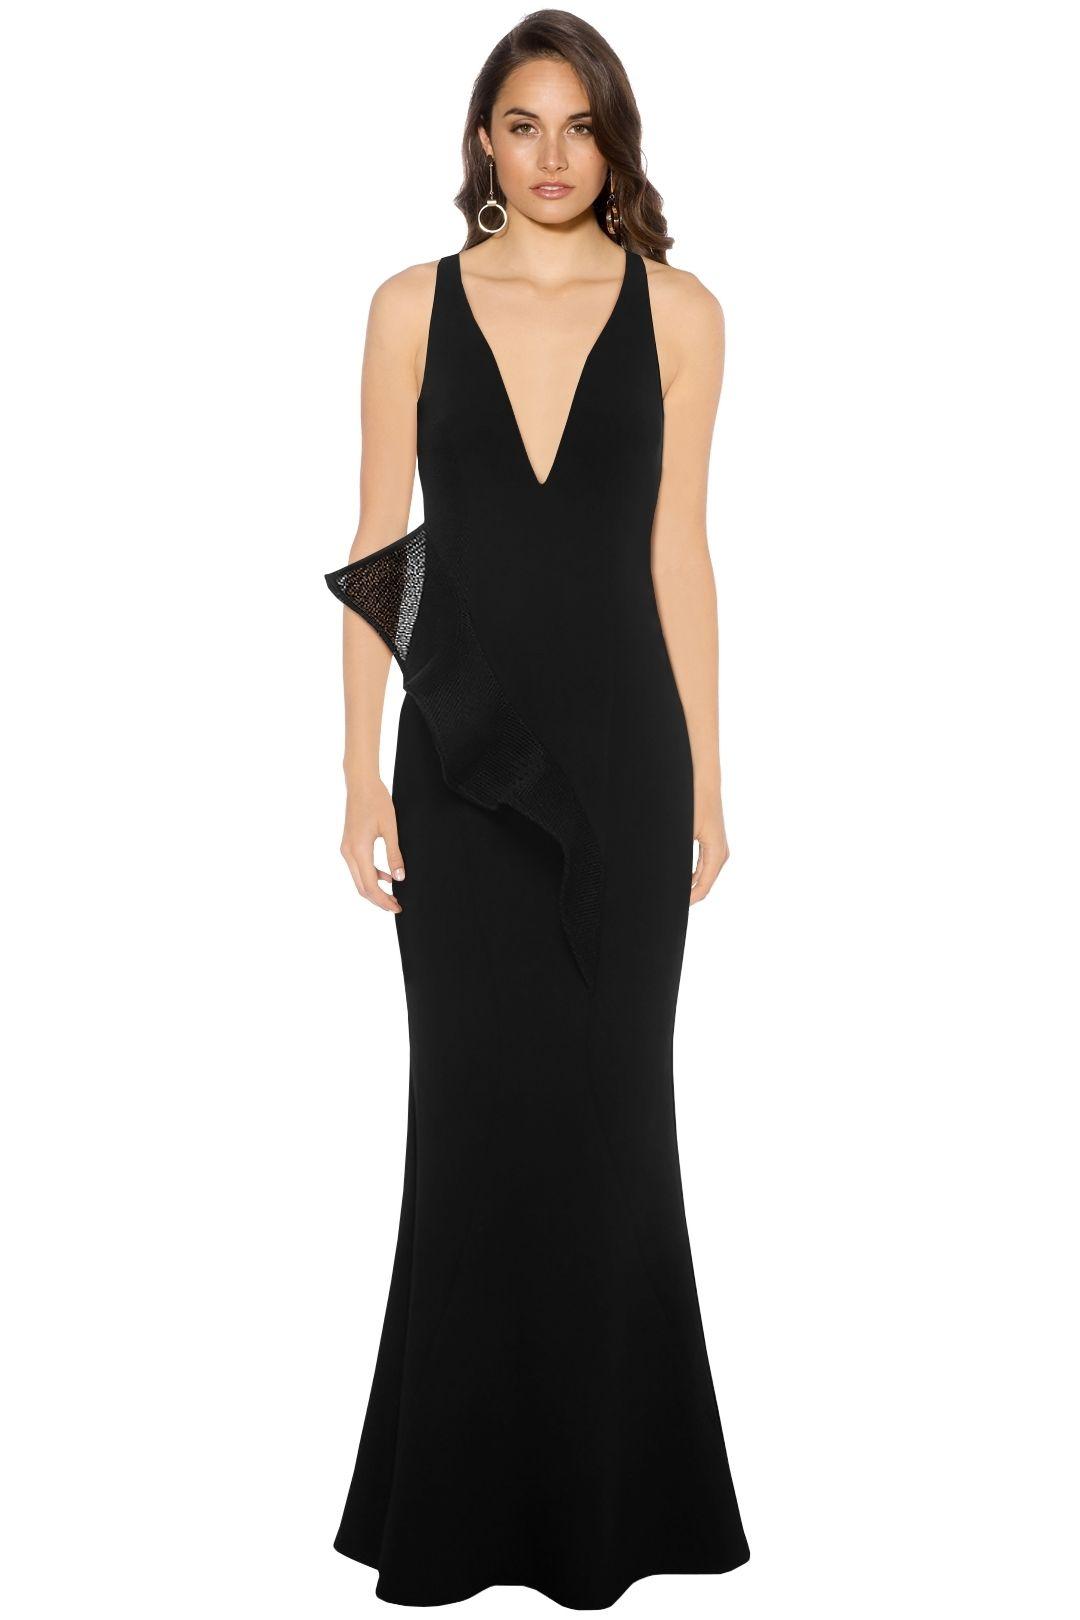 Sheike - Olivia Maxi Dress - Black - Front